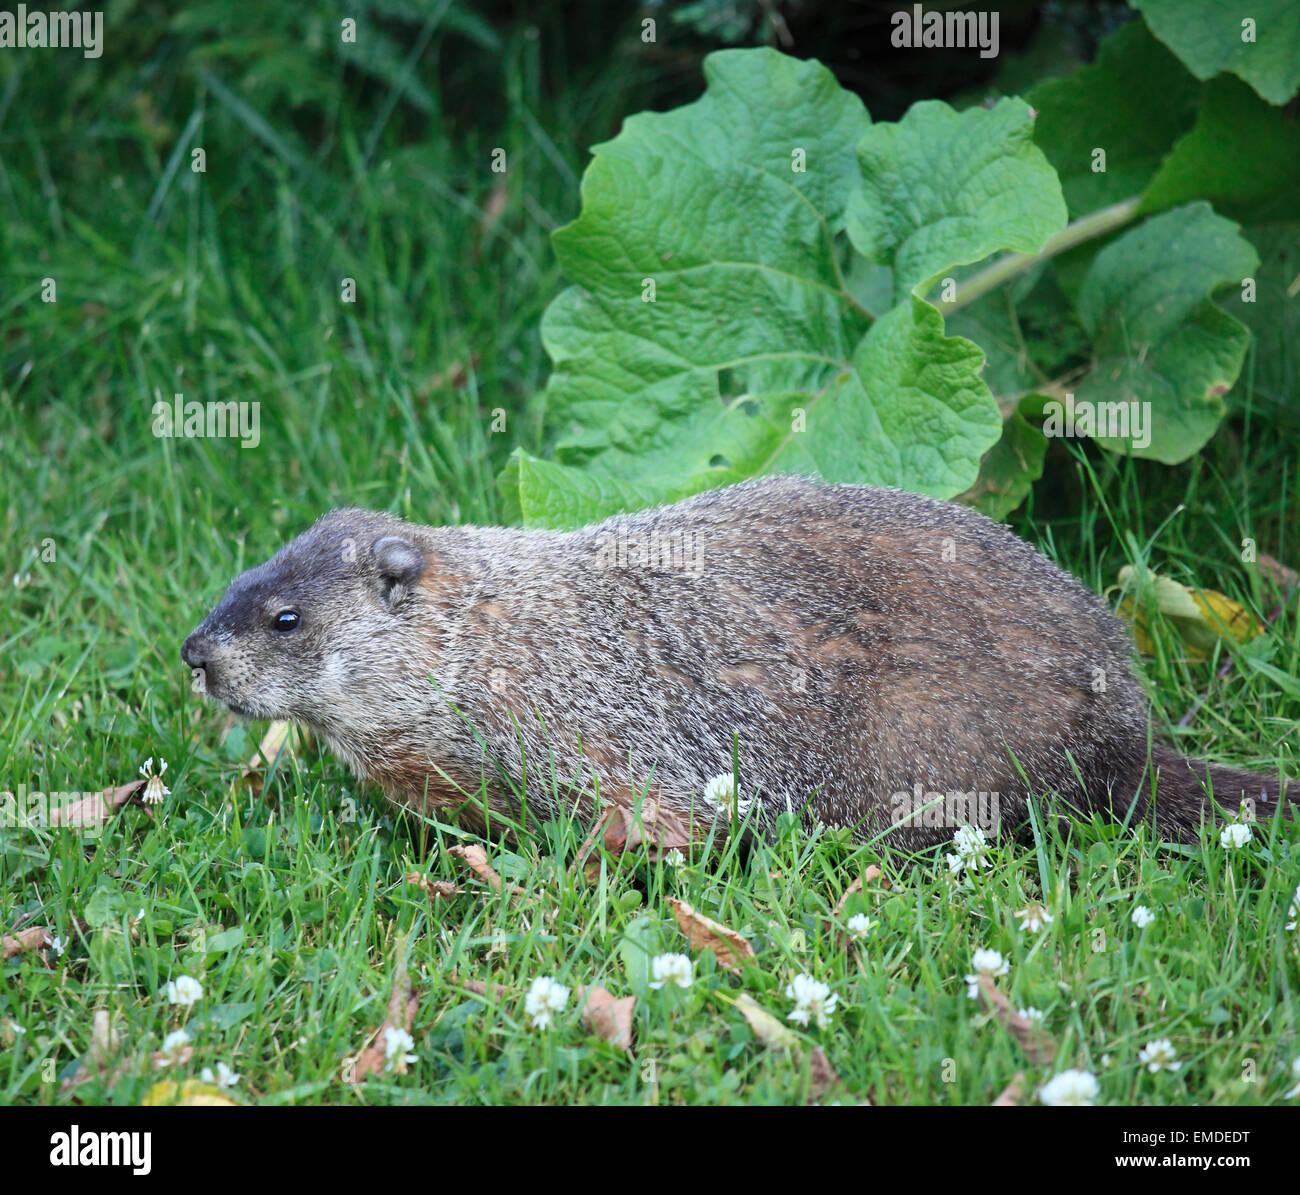 Canada, Quebec, Montreal, groundhog, marmota monax, - Stock Image